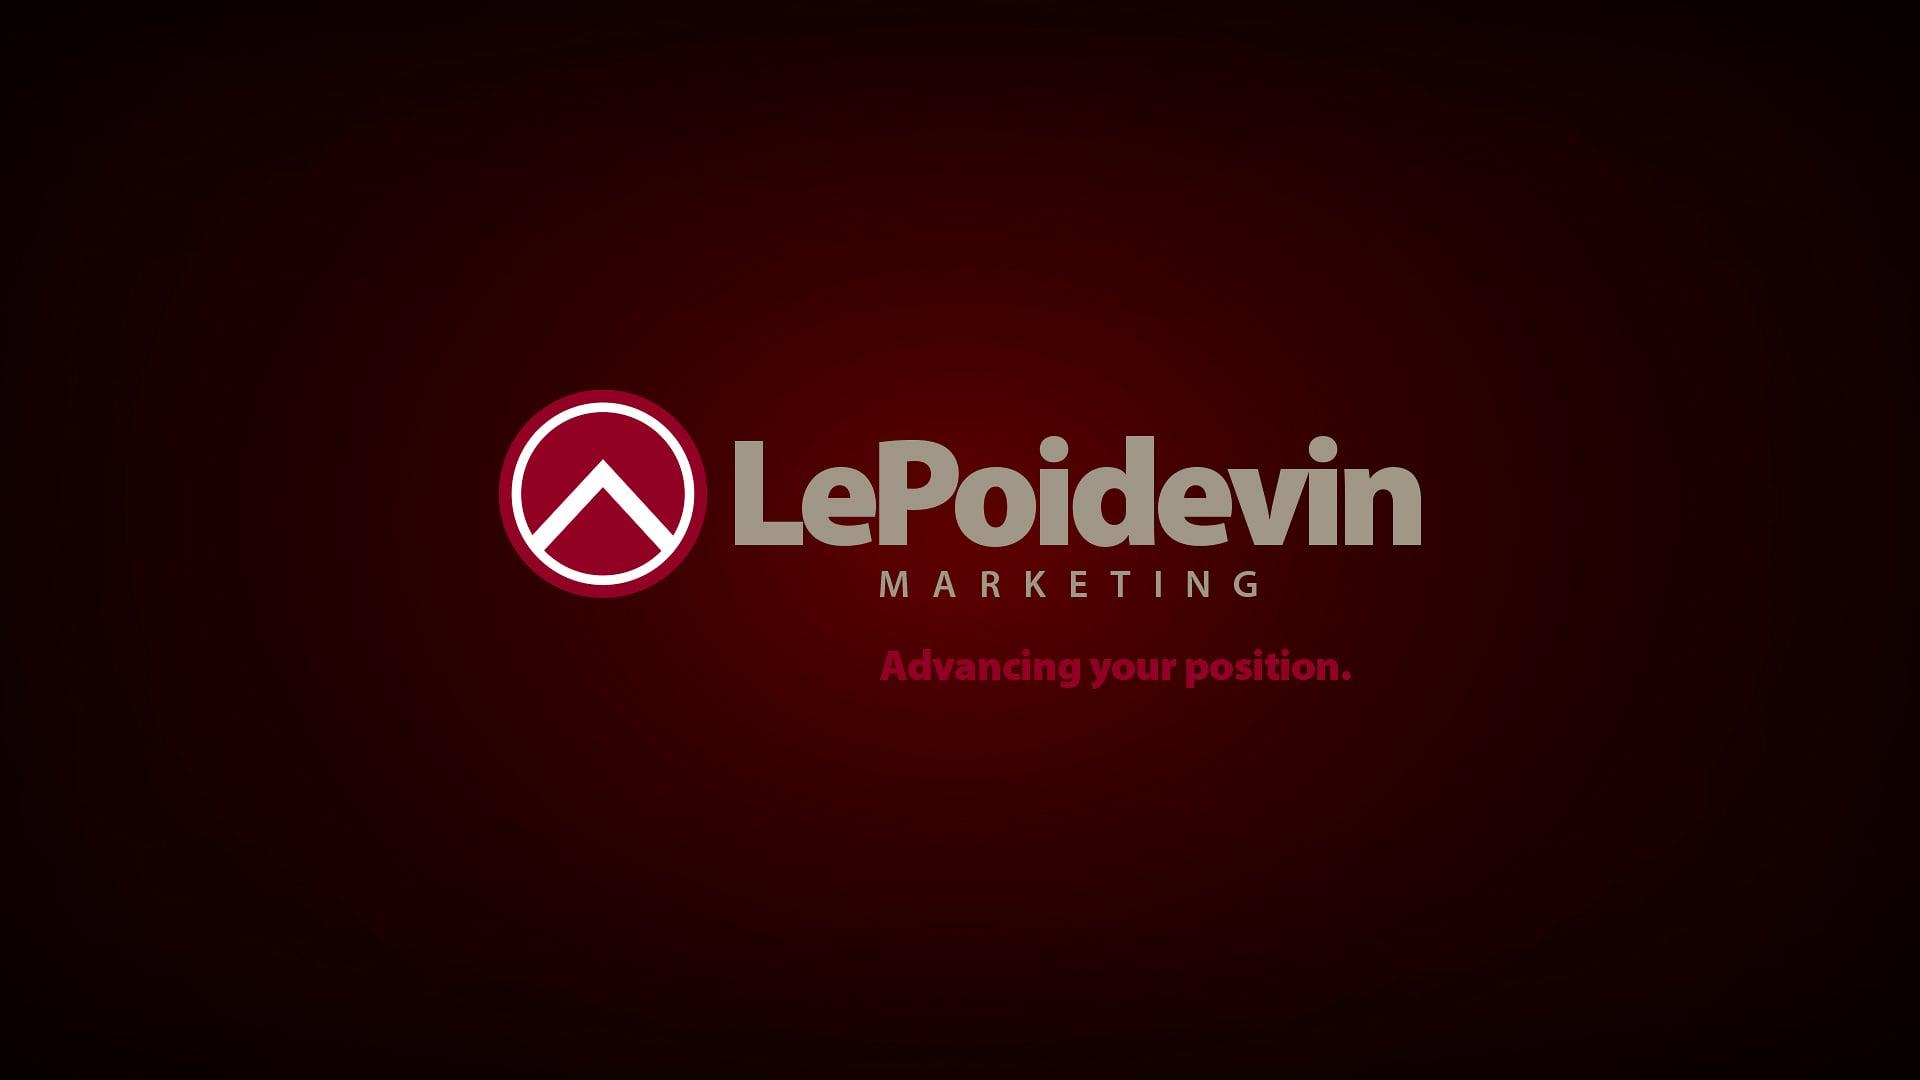 WLEP LePoidevin TV